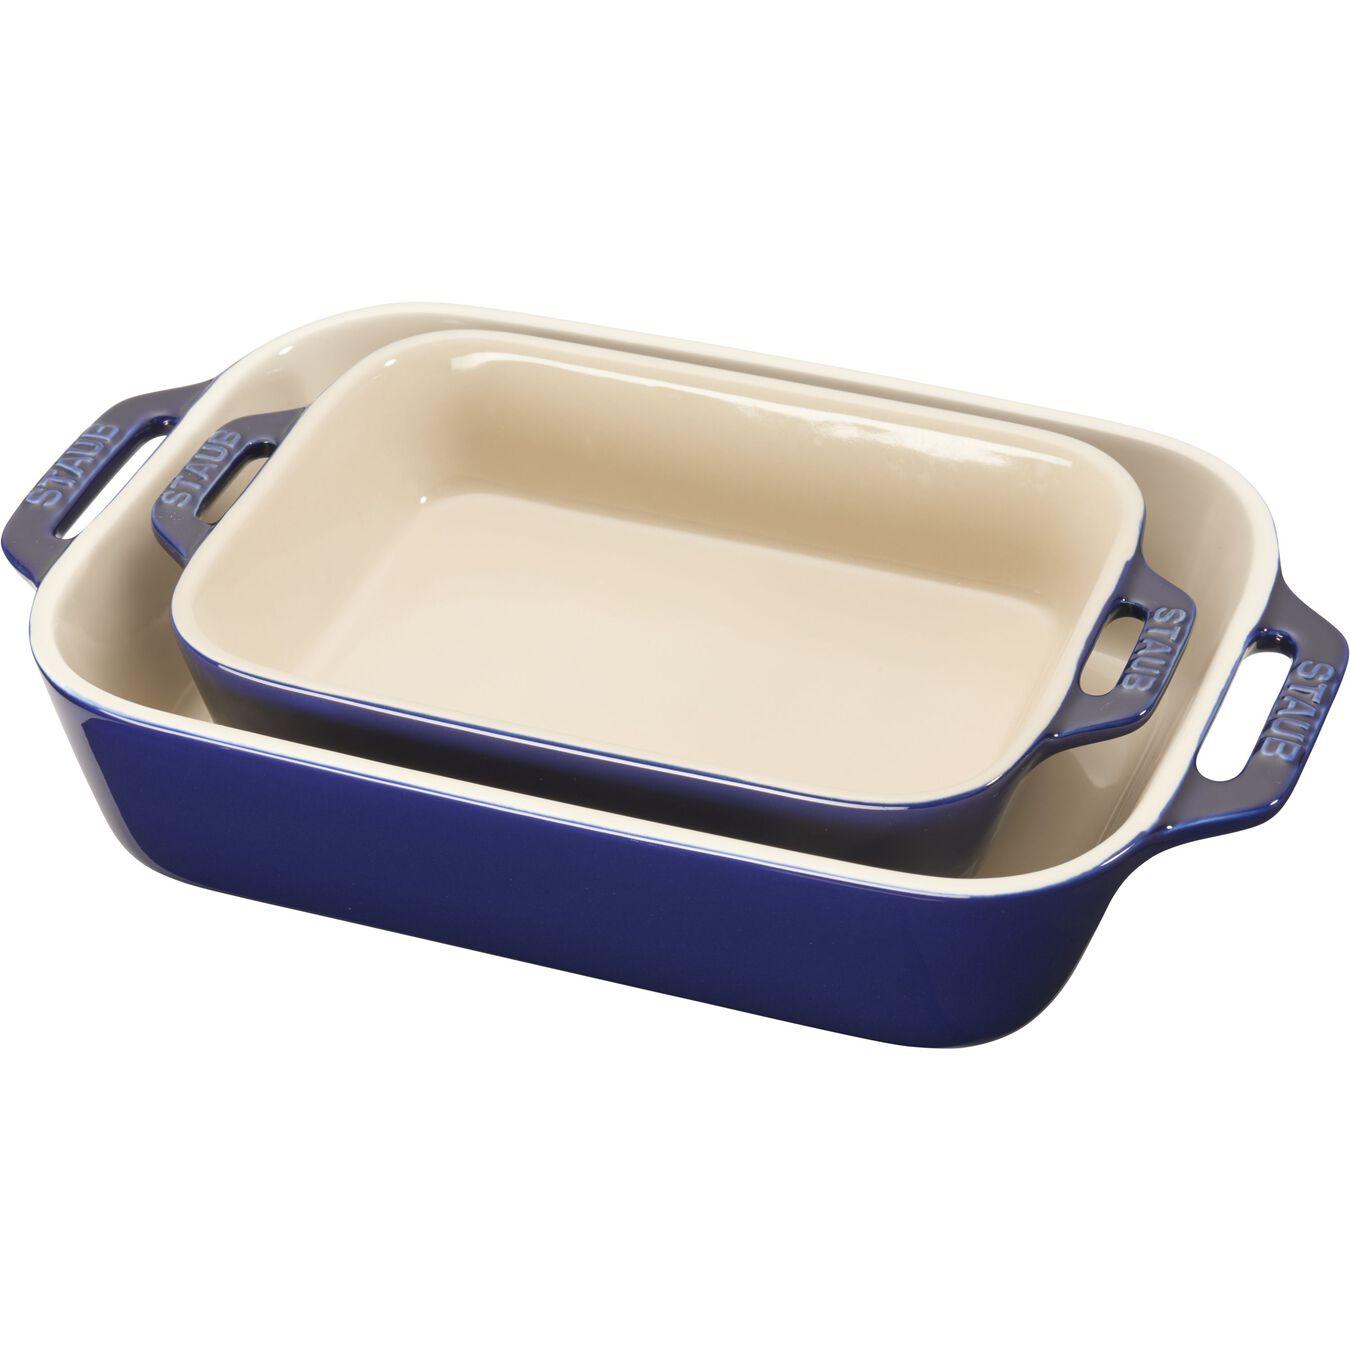 Ovenware set, 2 Piece | rectangular | dark-blue,,large 1